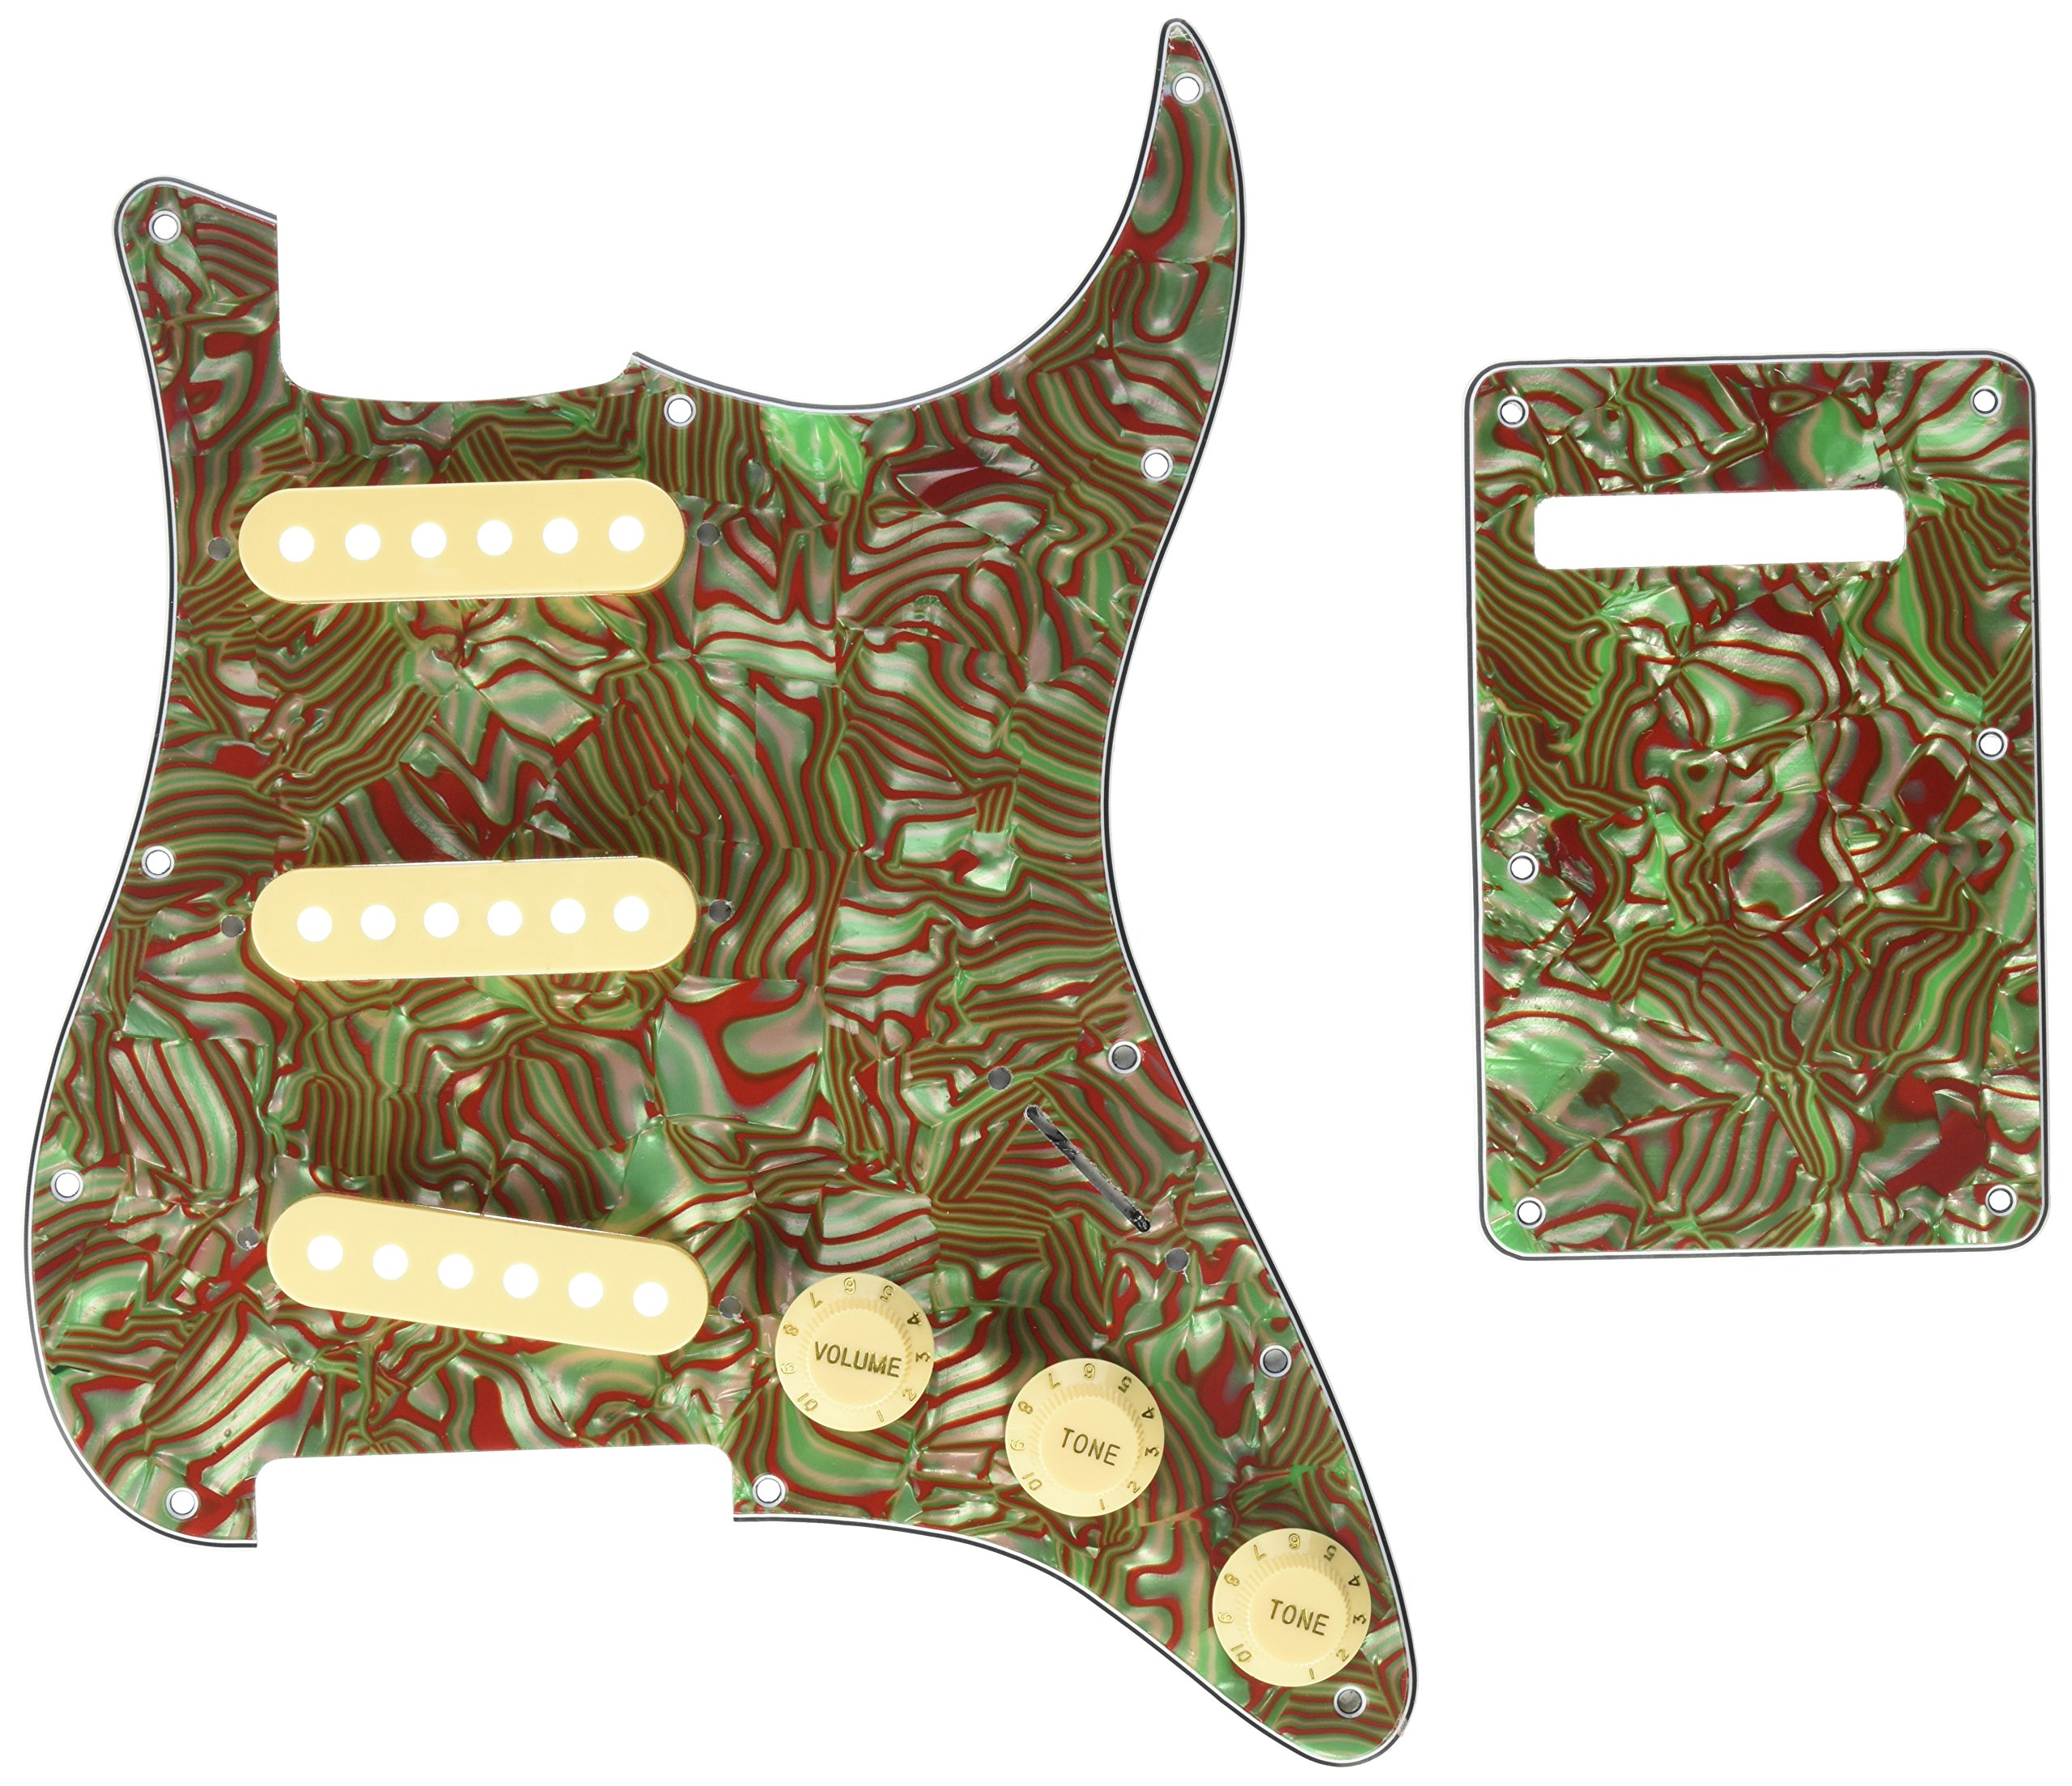 Kmise Z4705 Set Breen Shell Guitar Pickguard Back Plate Tremolo Cavity & Pickup Cover by Kmise (Image #1)